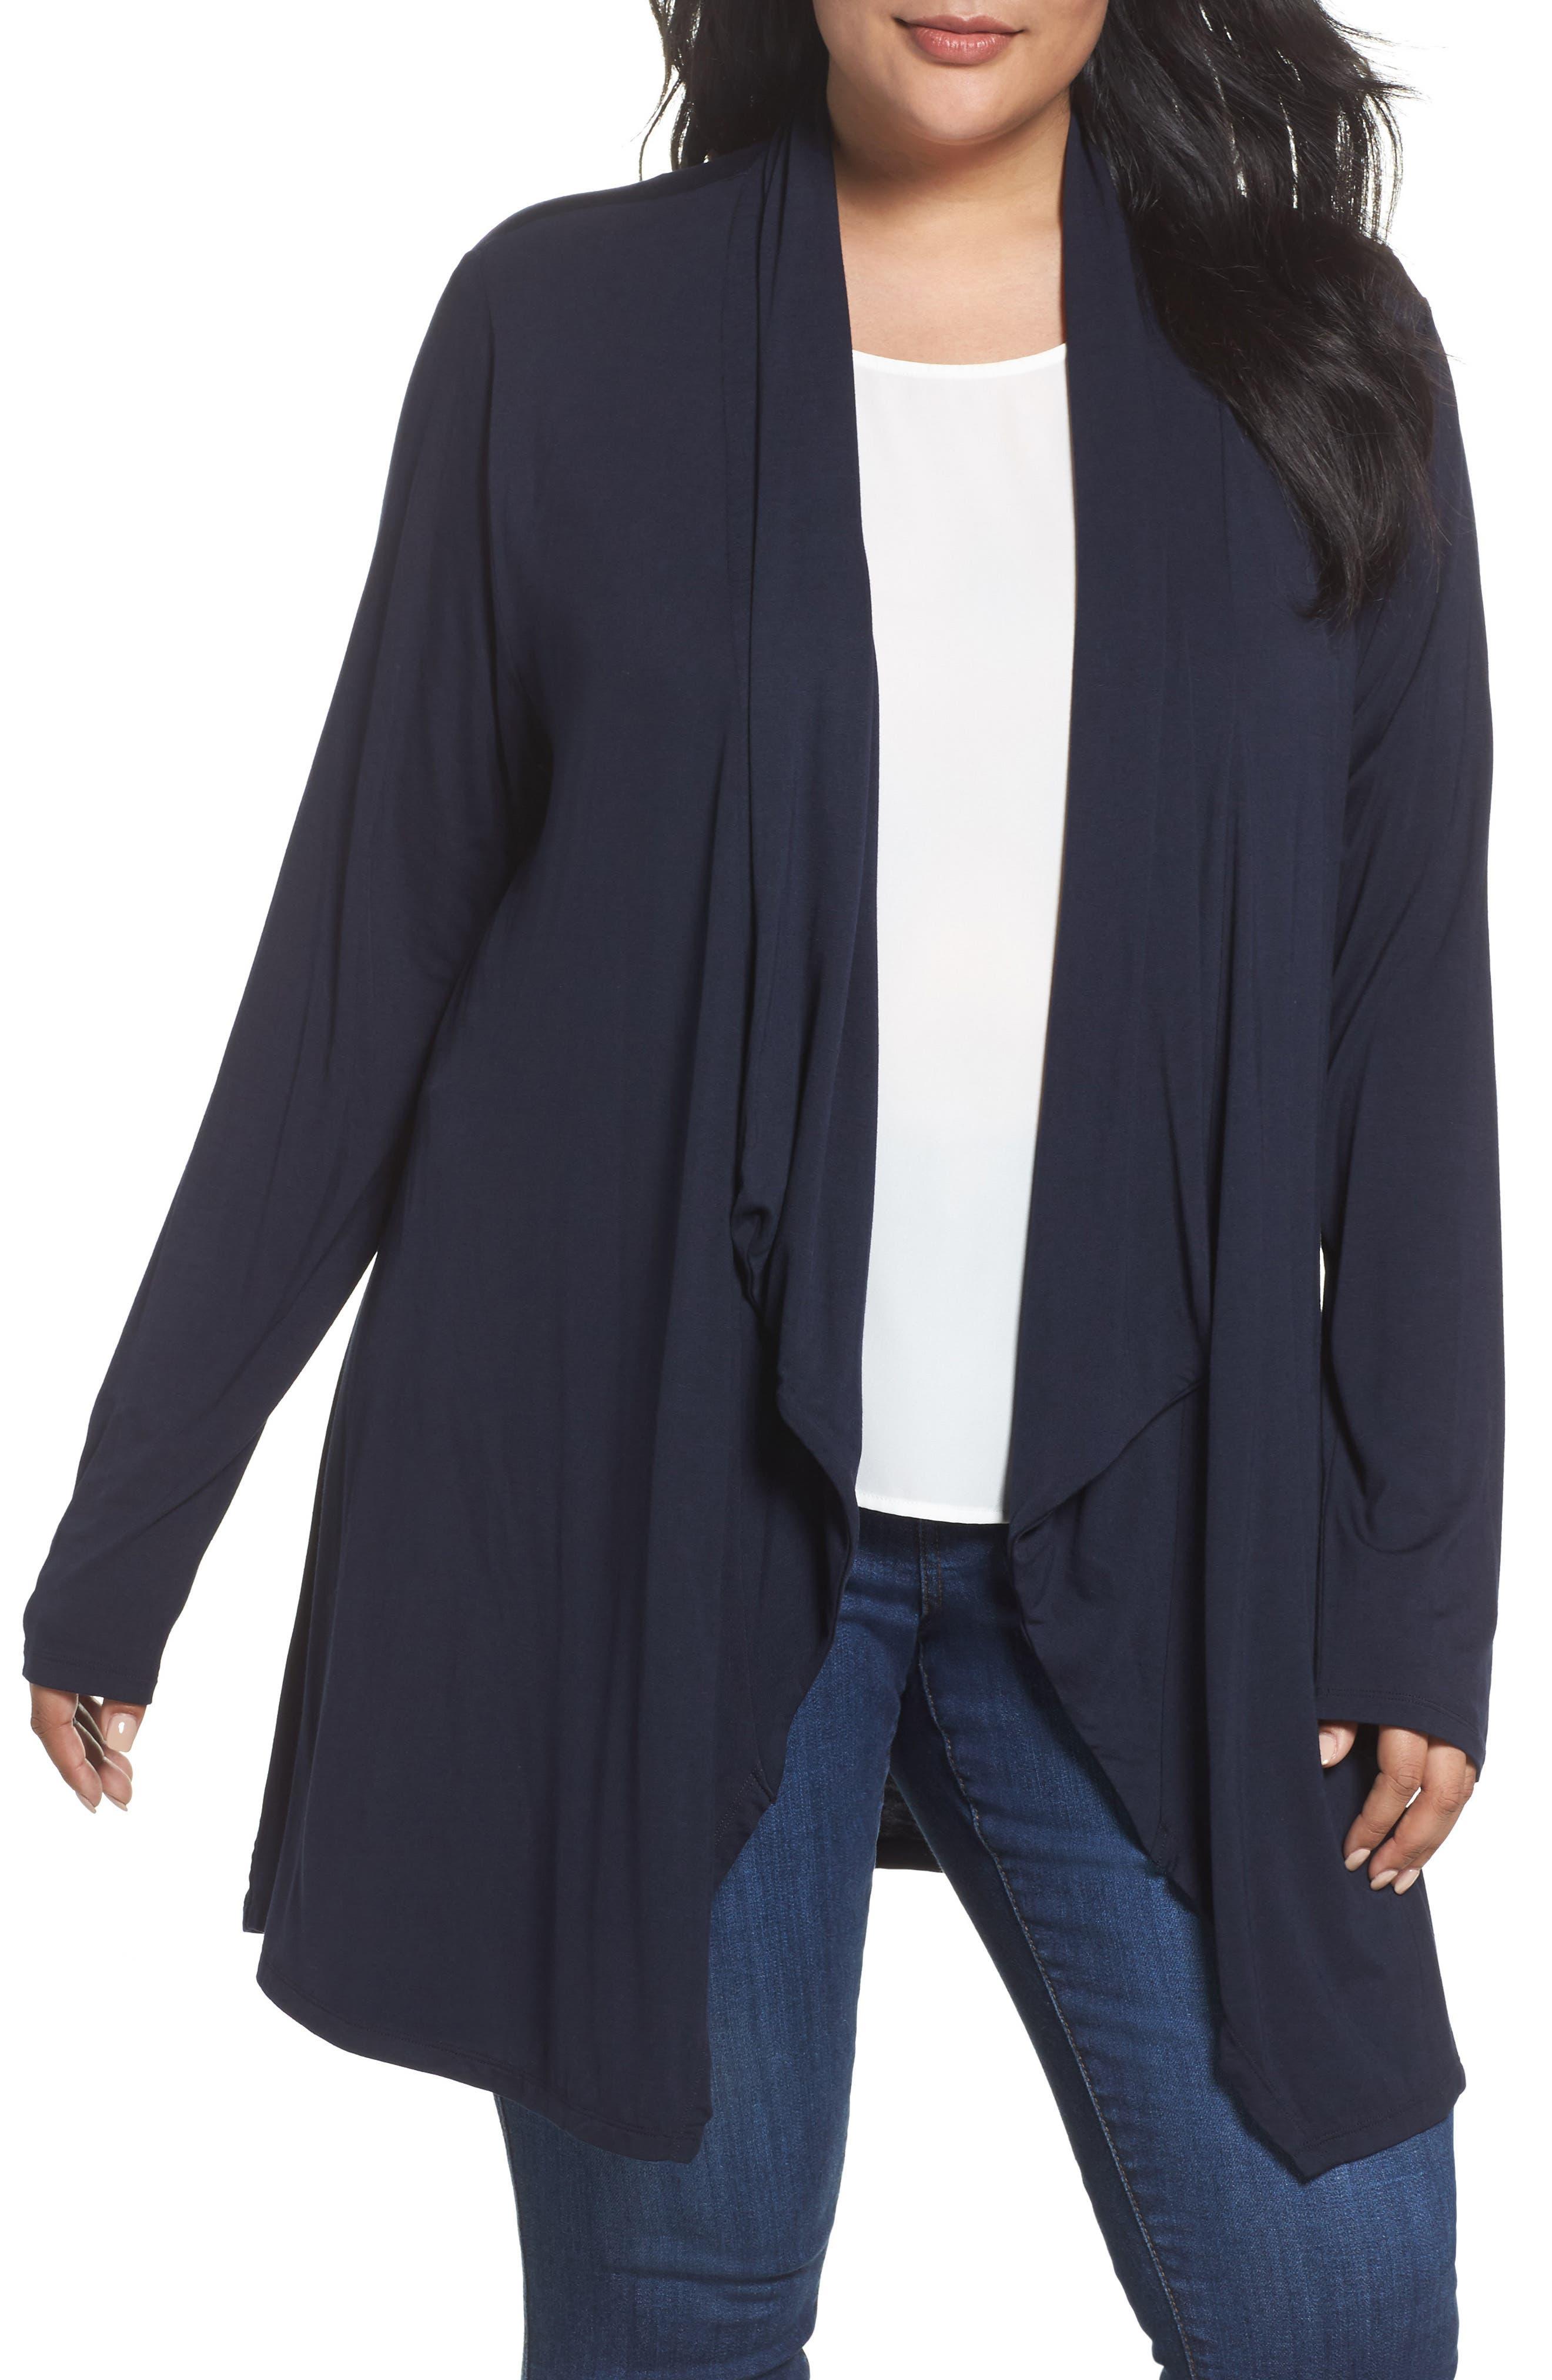 Dantelle Waterfall Drape Front Cardigan (Plus Size)